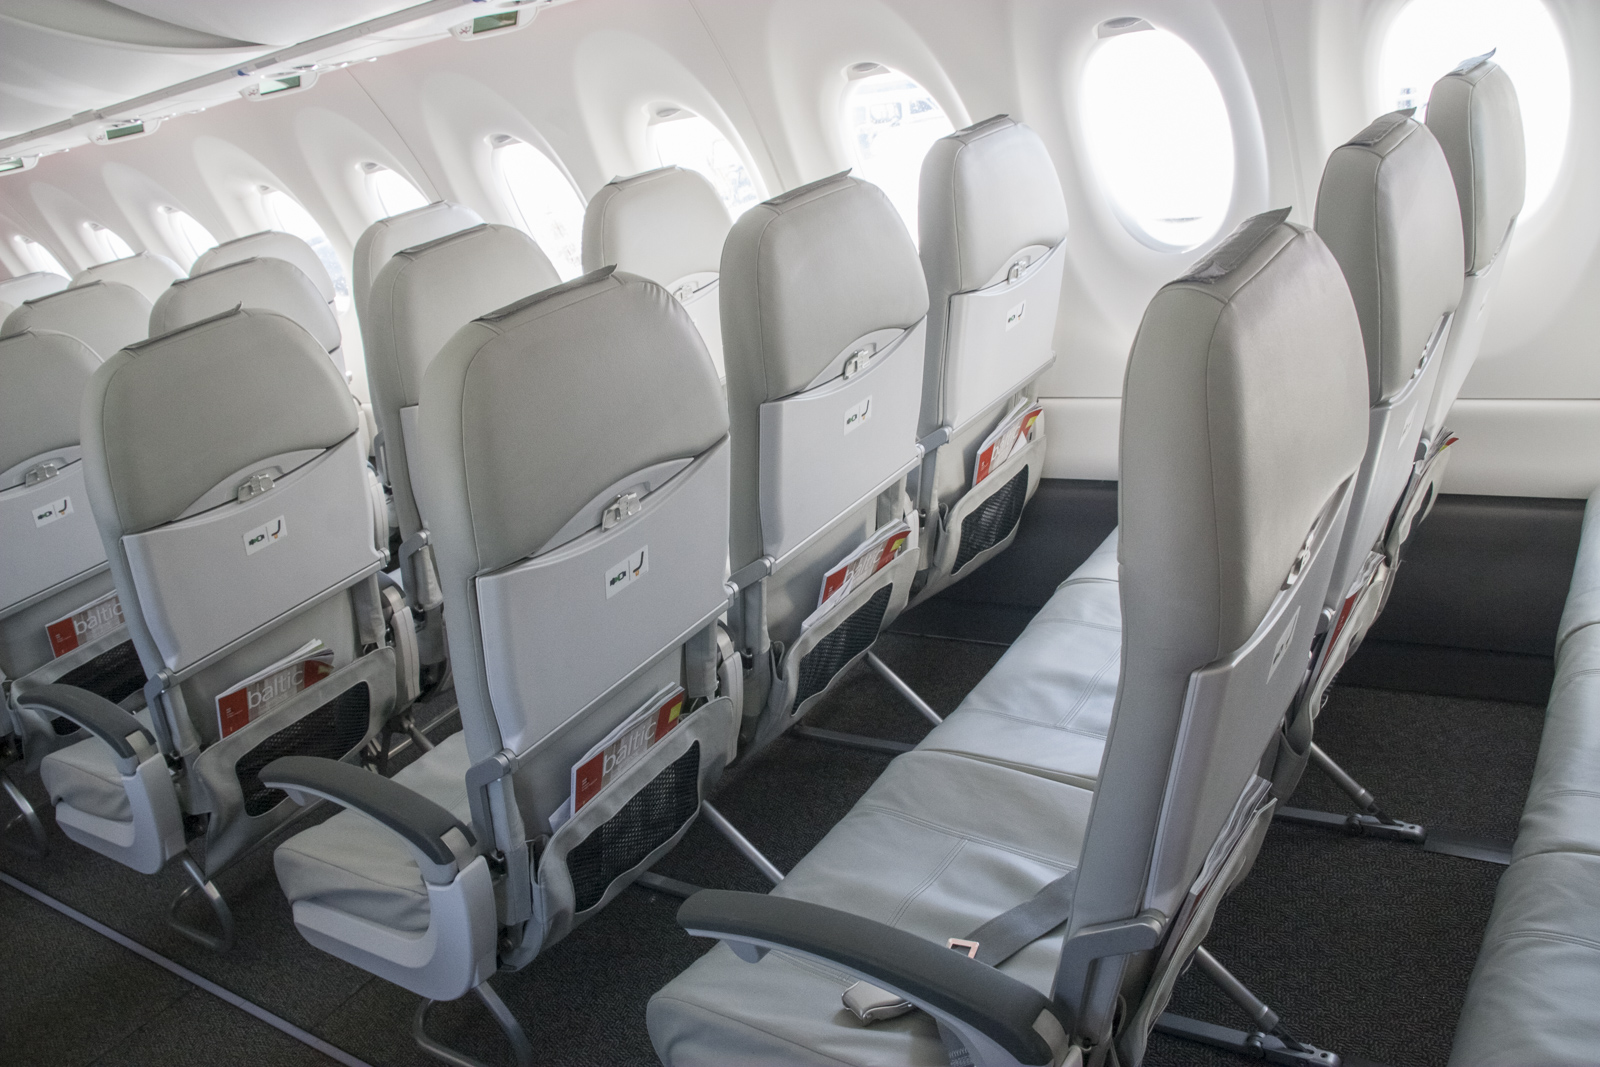 cs300 airbaltic conquered moscow russian aviation ruaviation com. Black Bedroom Furniture Sets. Home Design Ideas